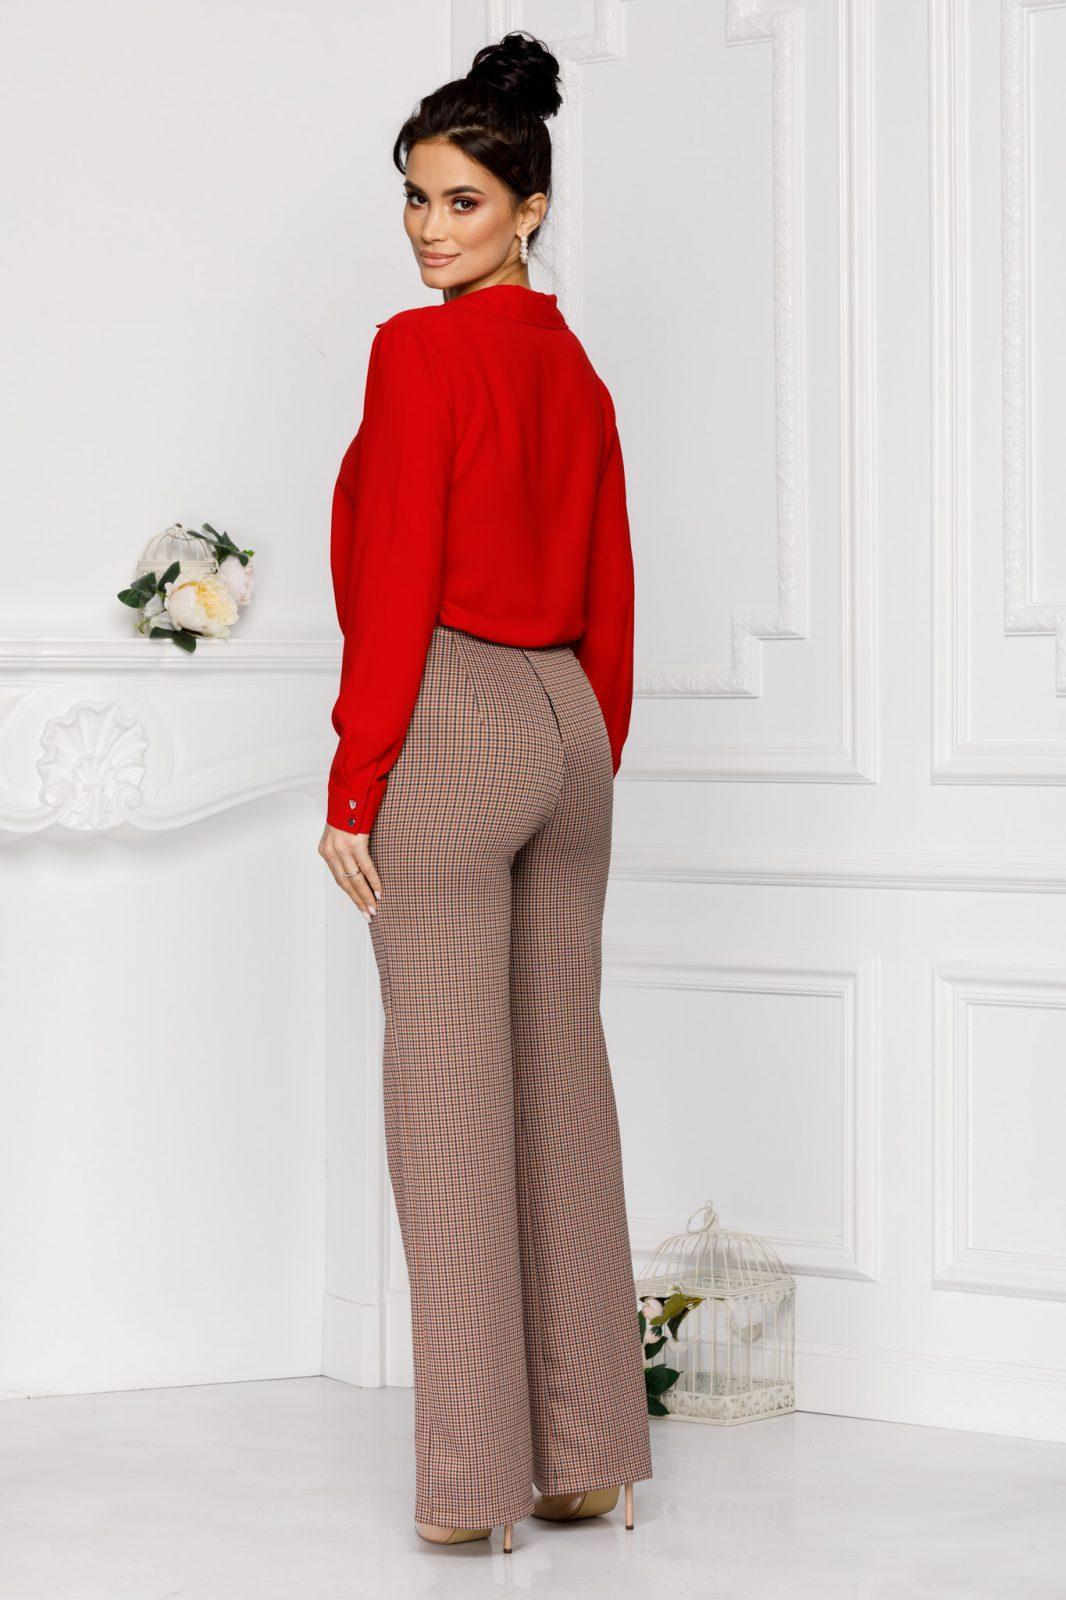 Sya Κόκκινη Μπλούζα 7013